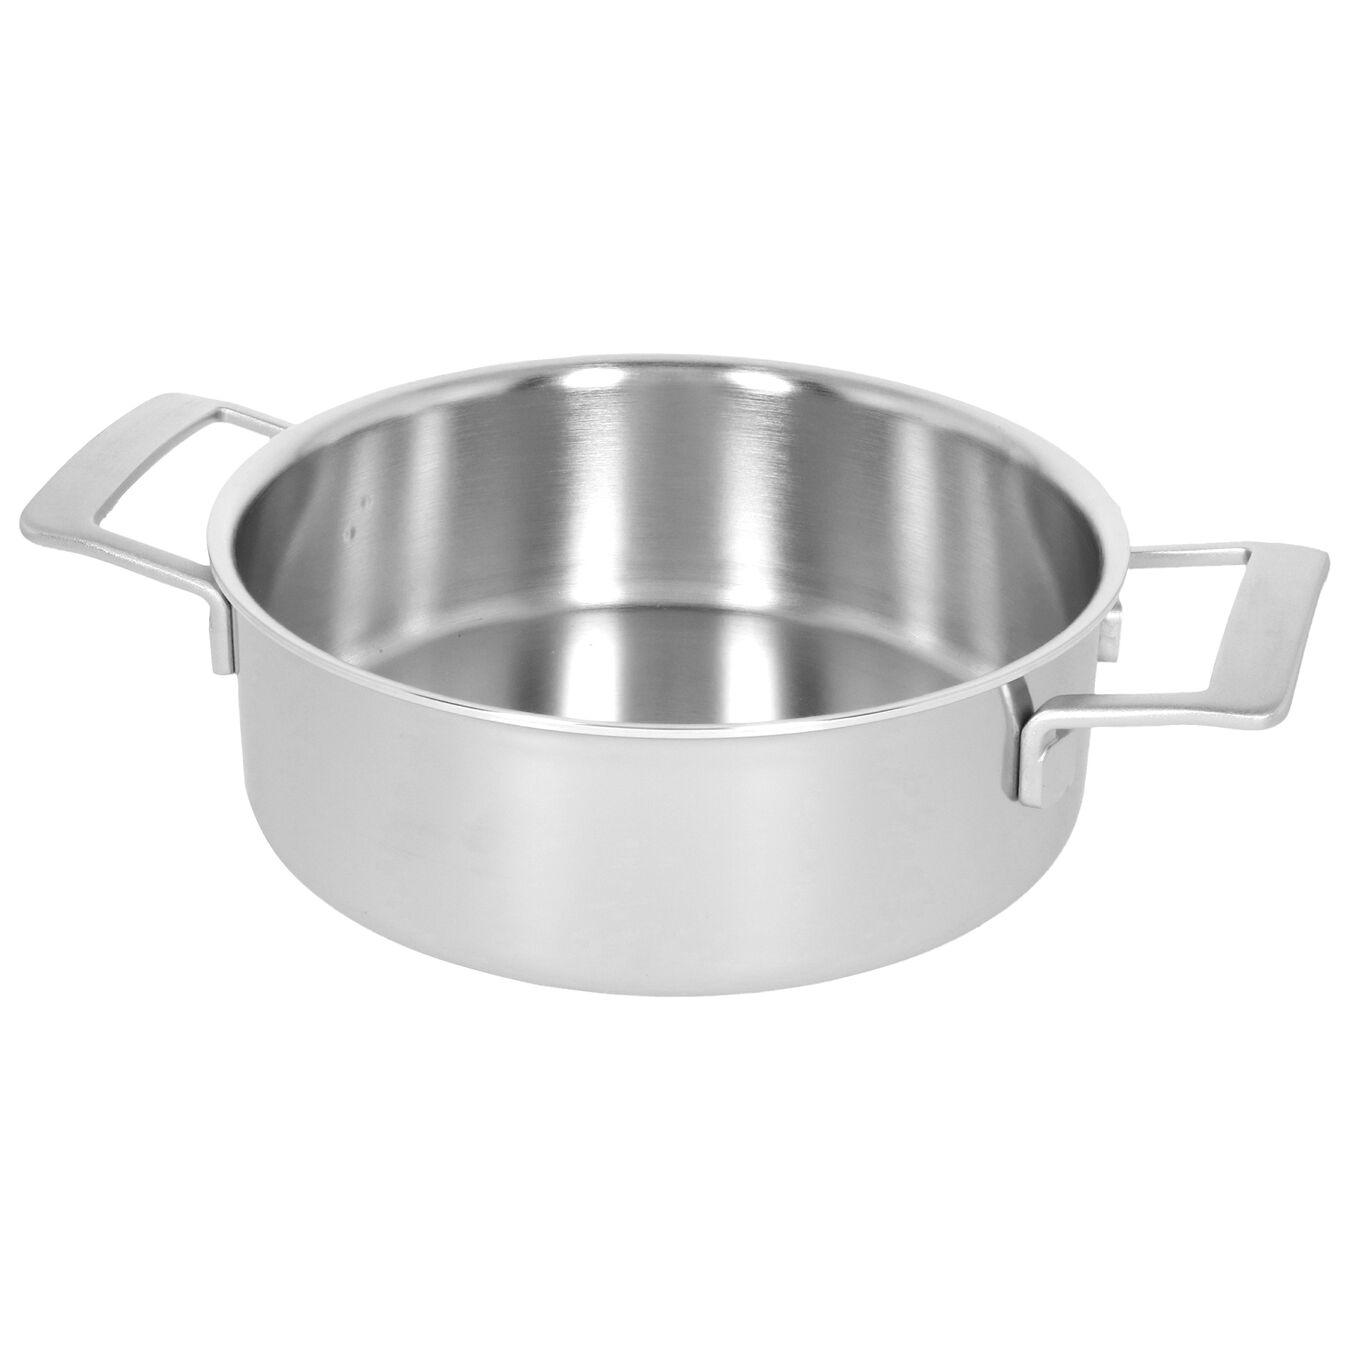 Kookpot met deksel, 24 cm / 3,8 l,,large 5